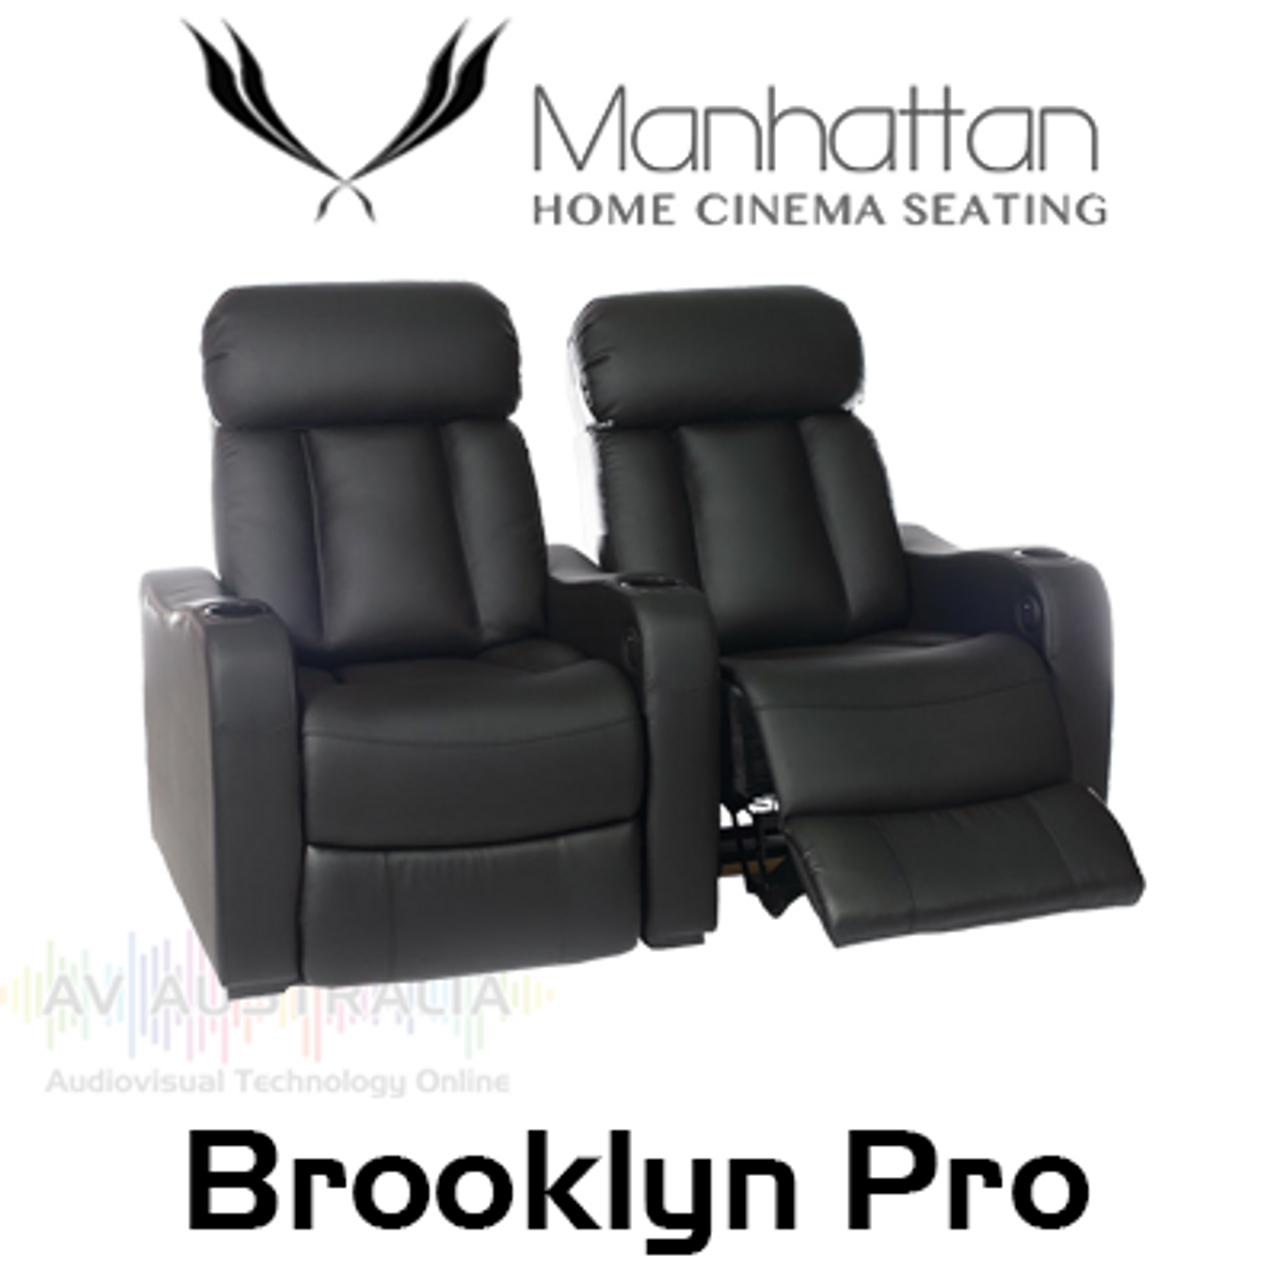 Manhattan Brooklyn Pro Leather / Suede Finish Cinema Seating